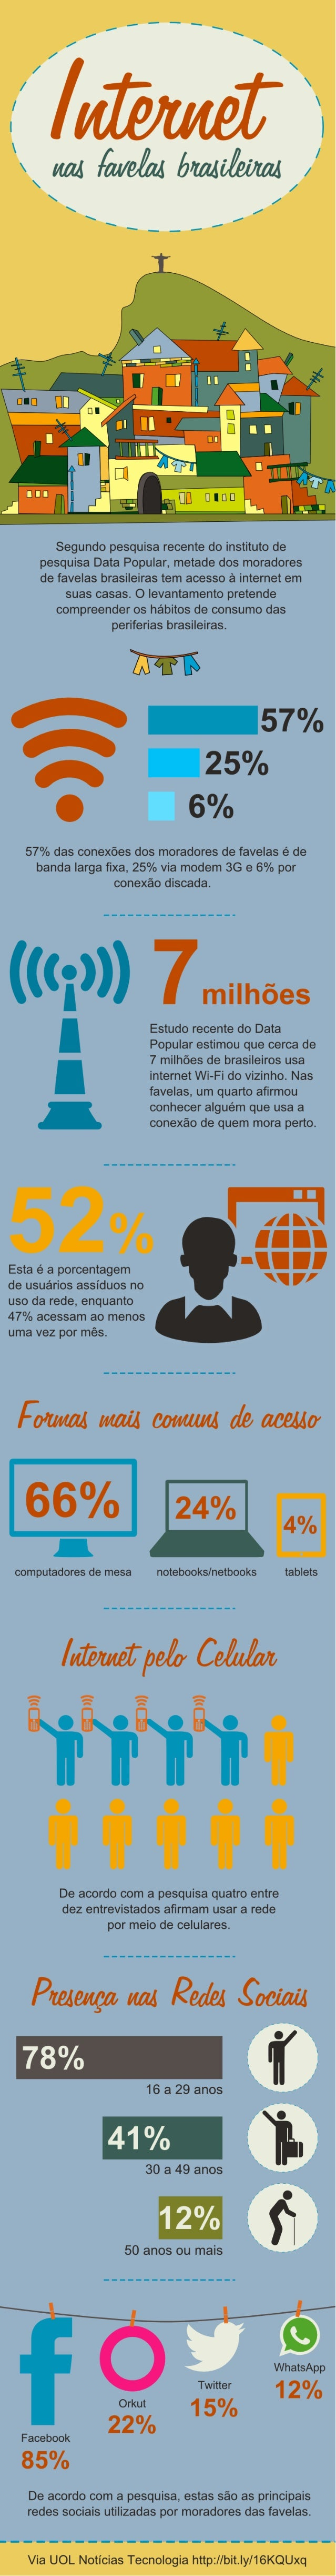 Infográfico: Internet nas favelas brasileiras